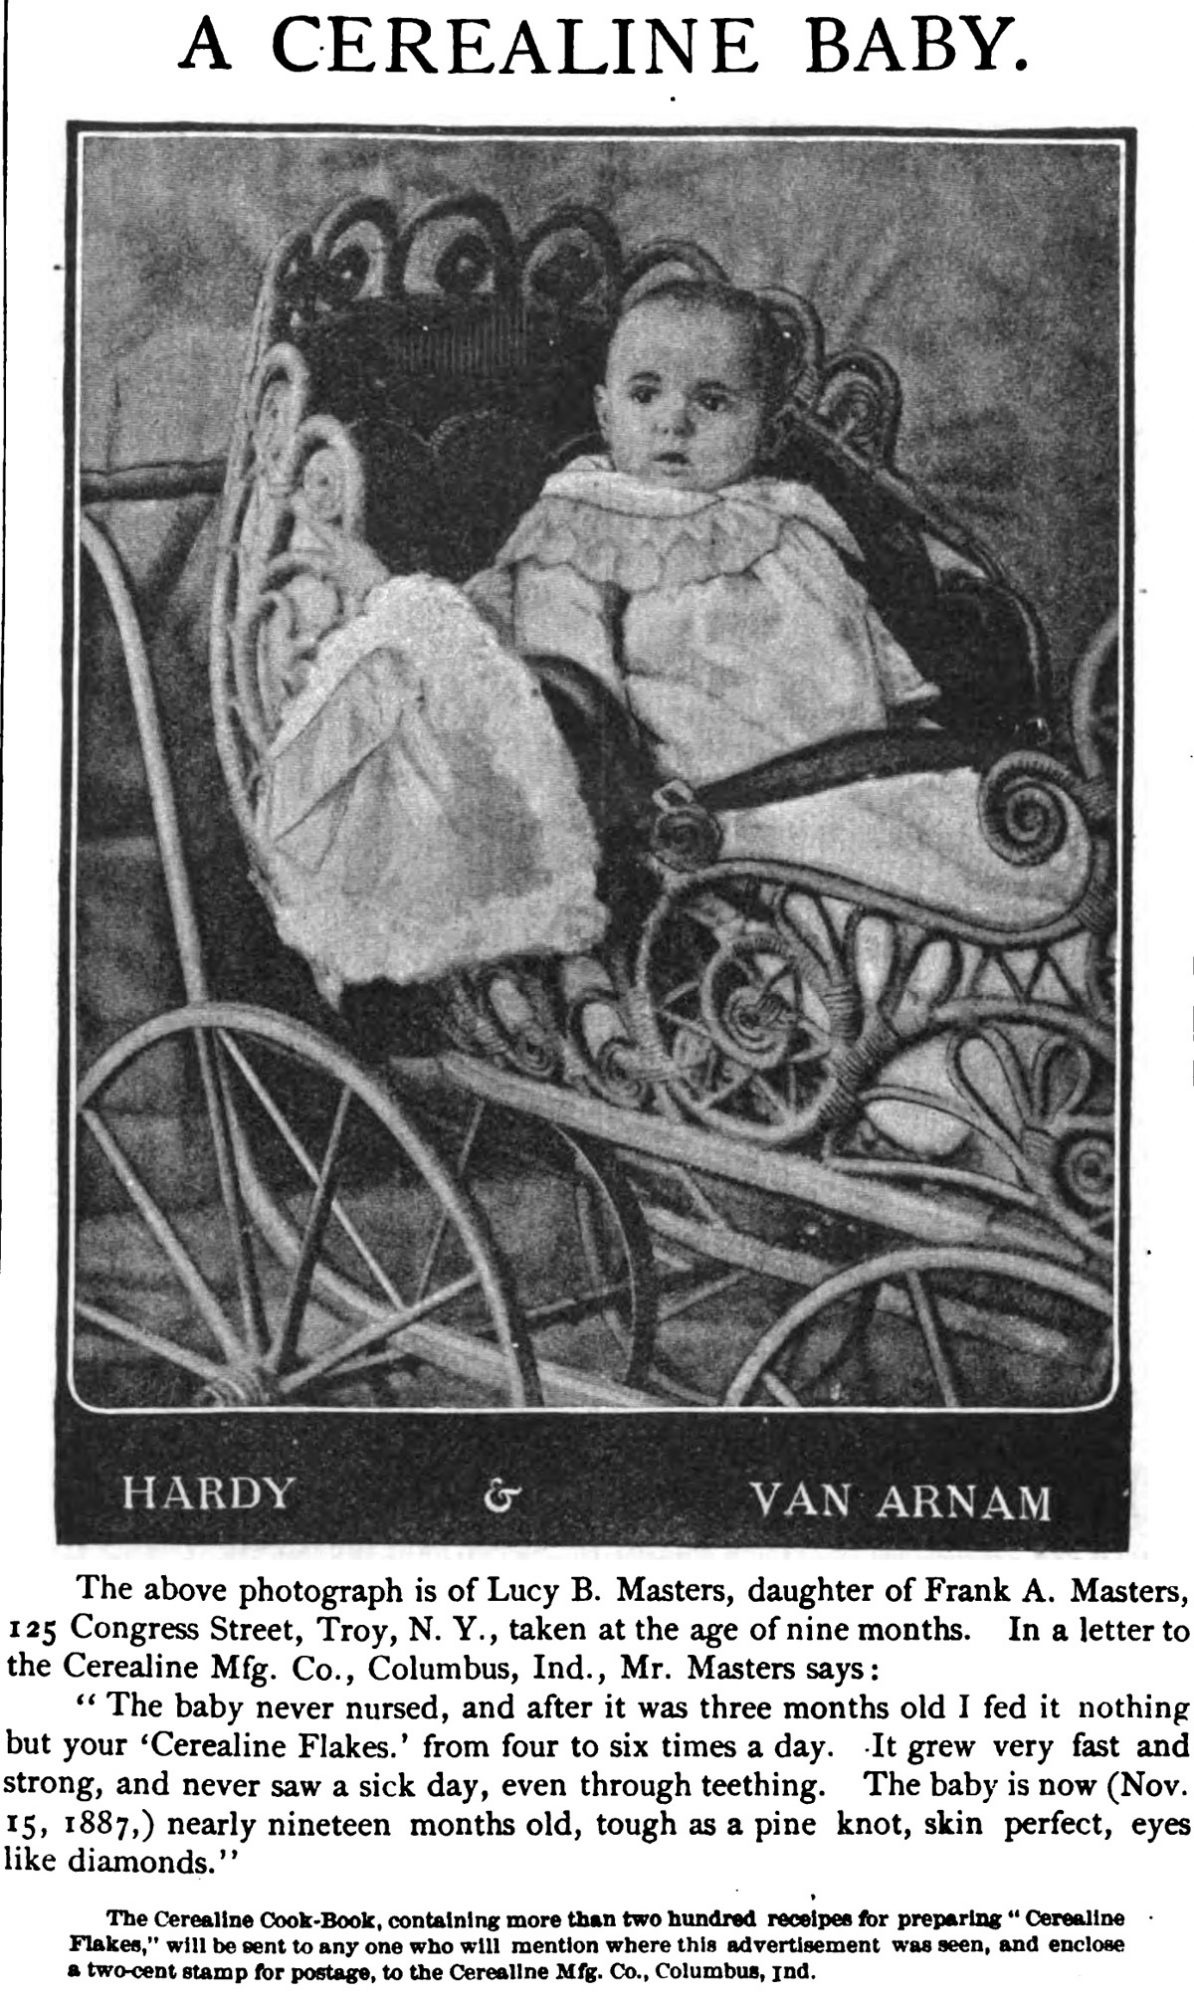 Ladies' Home Journal and Practical Housekeeper Vol.5 No.05 (April, 1888)